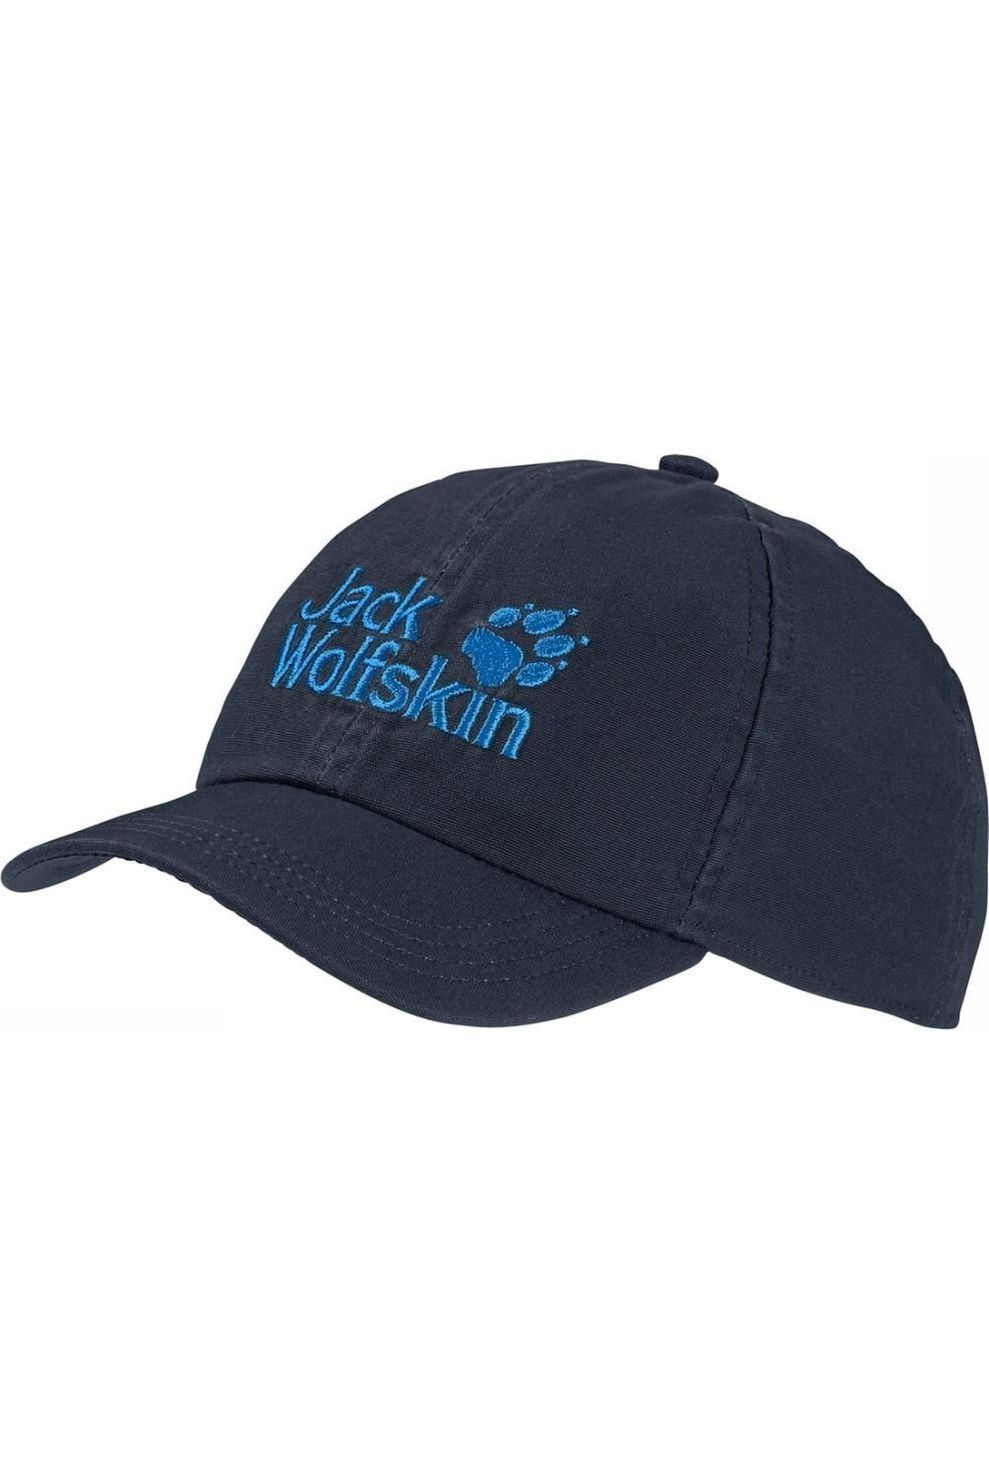 Jack Wolfskin Pet Baseball - Blauw